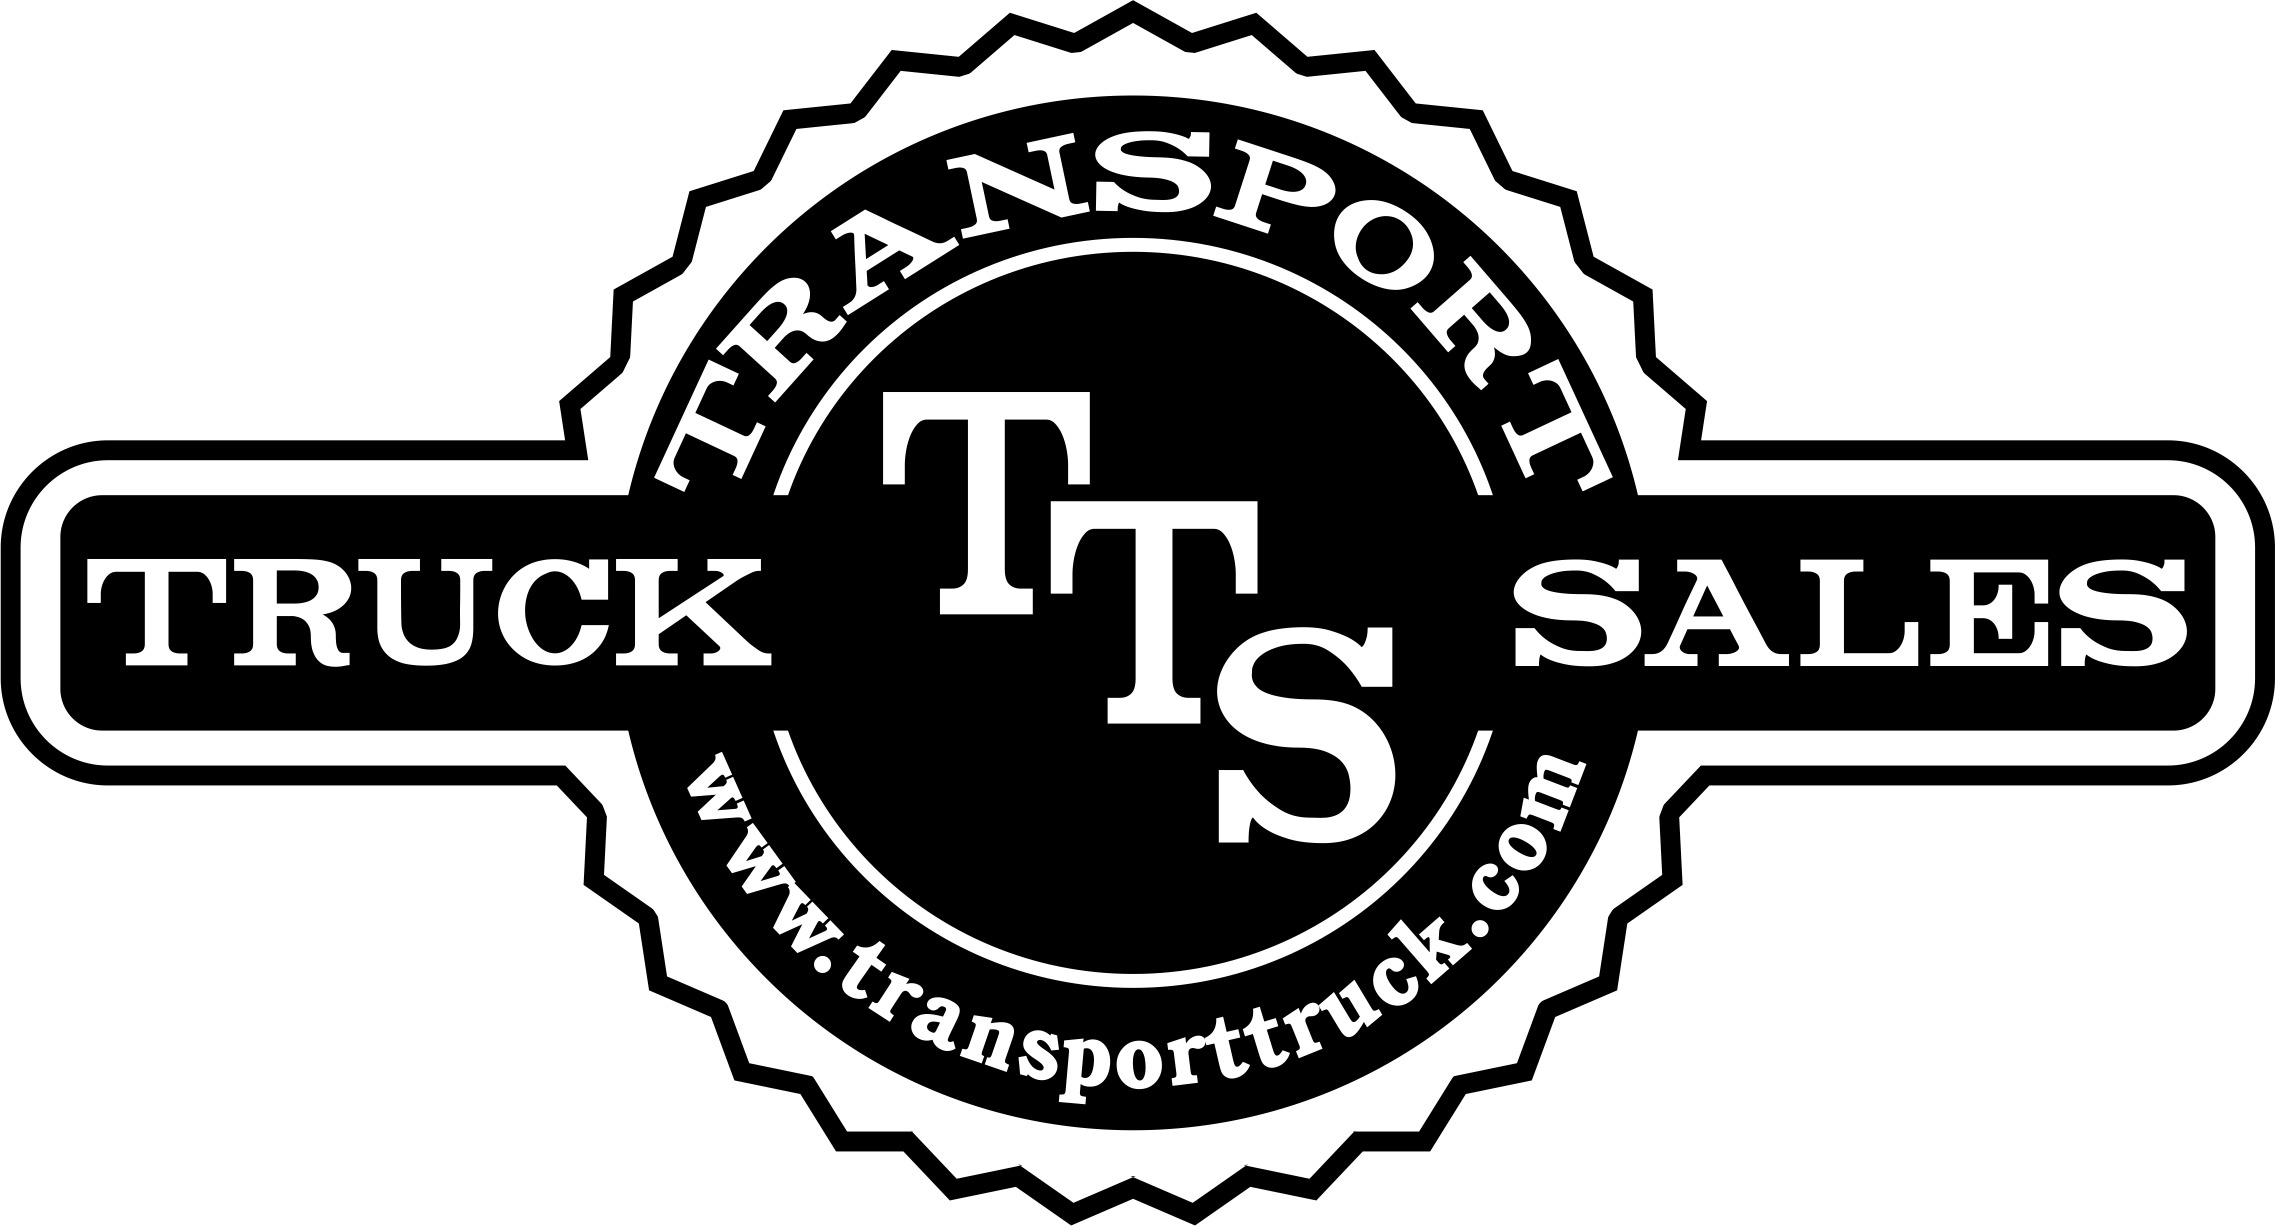 Transport Truck Sales Inc.